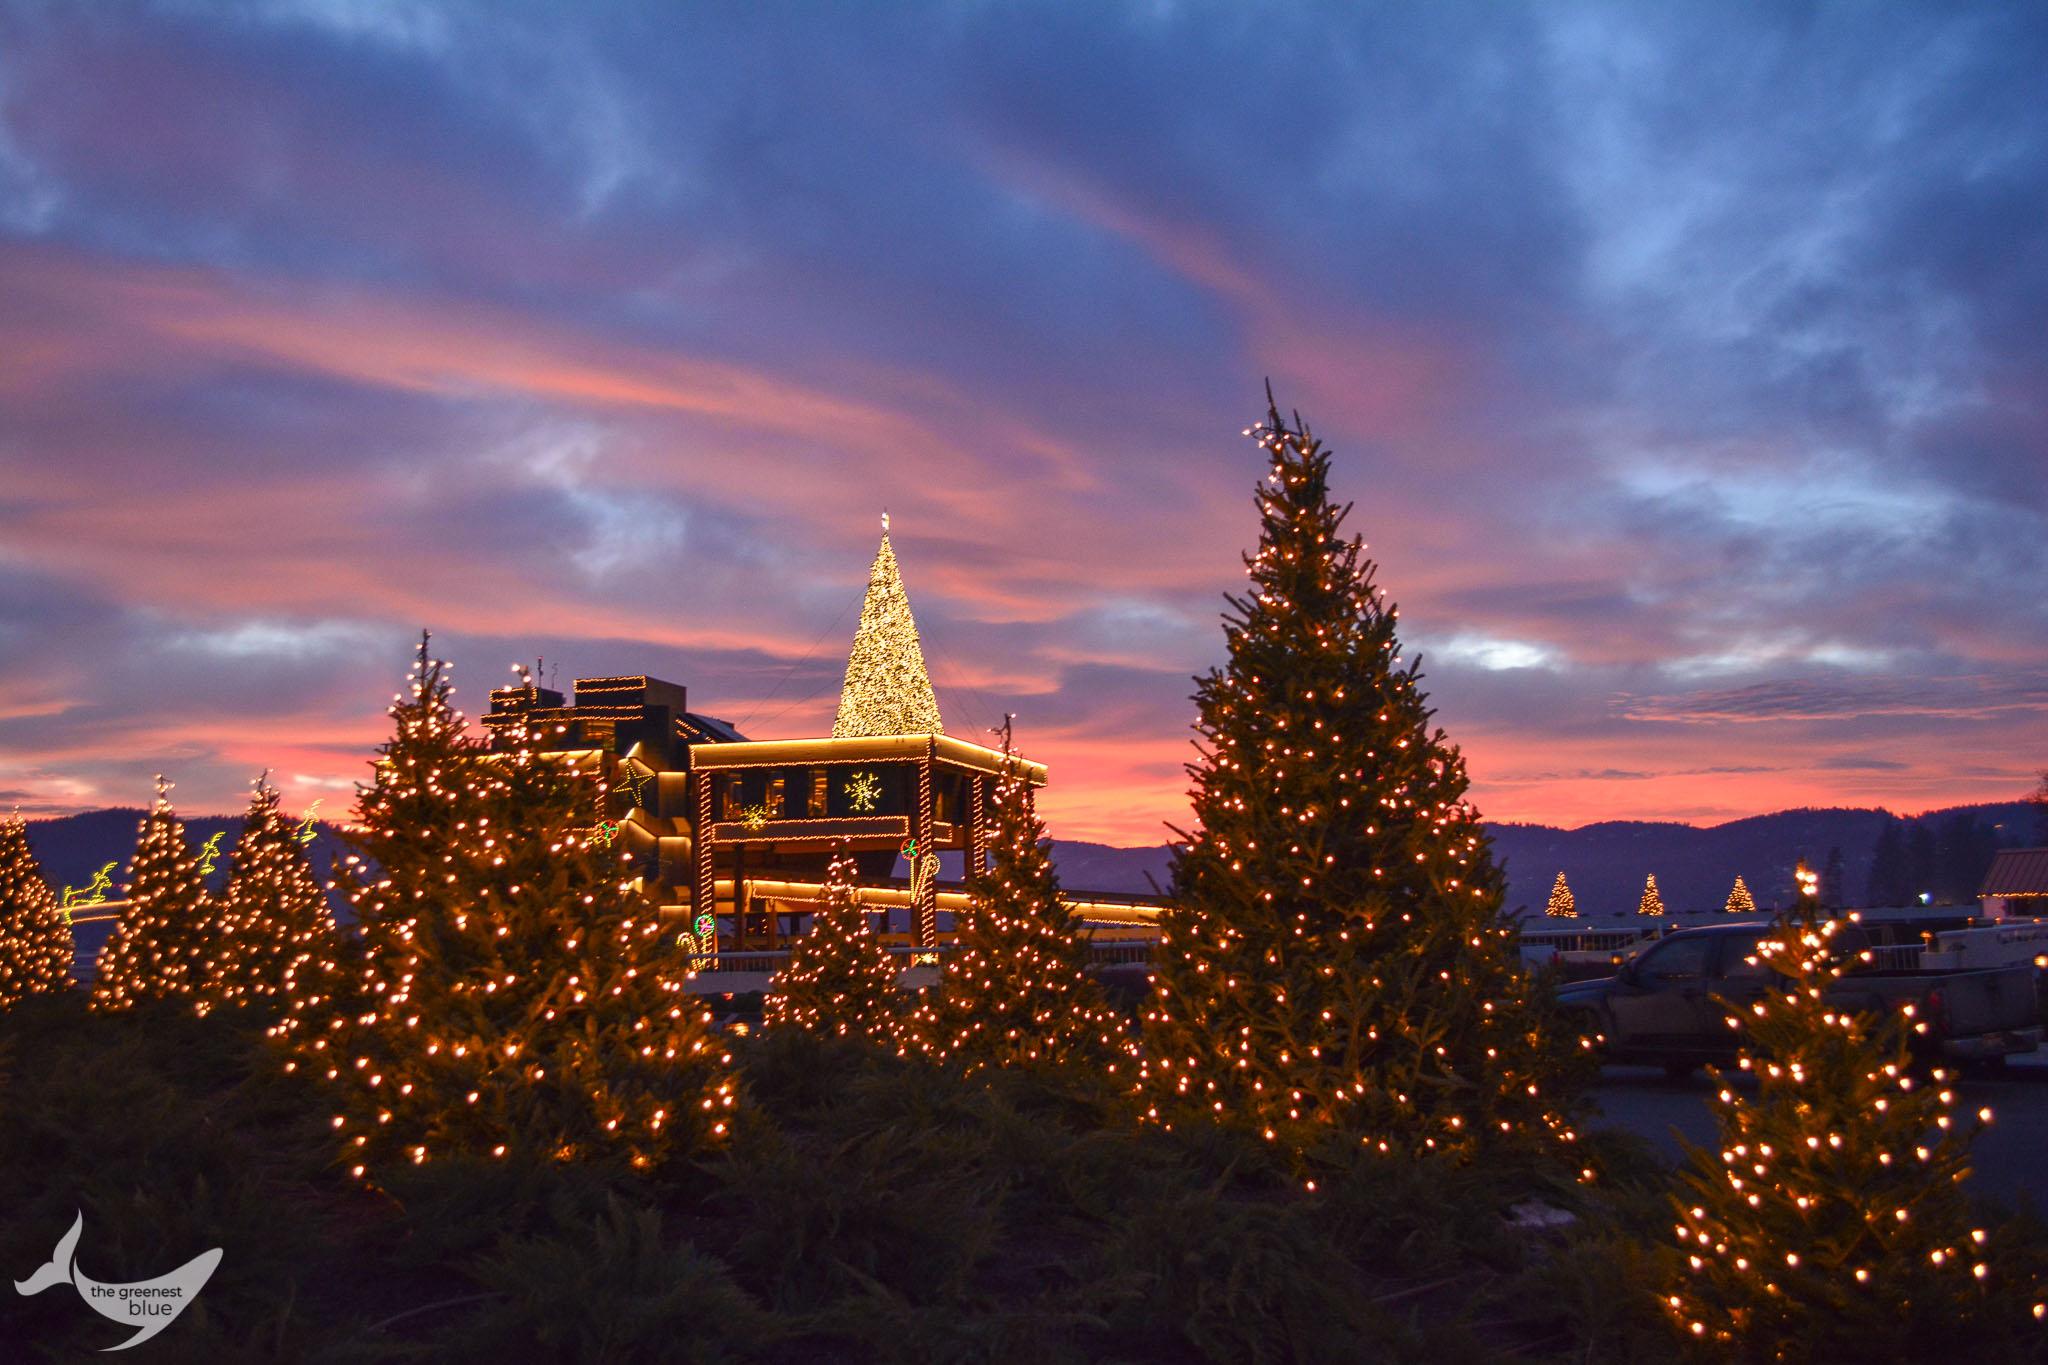 Holidays in Coeur d'Alene, Idaho